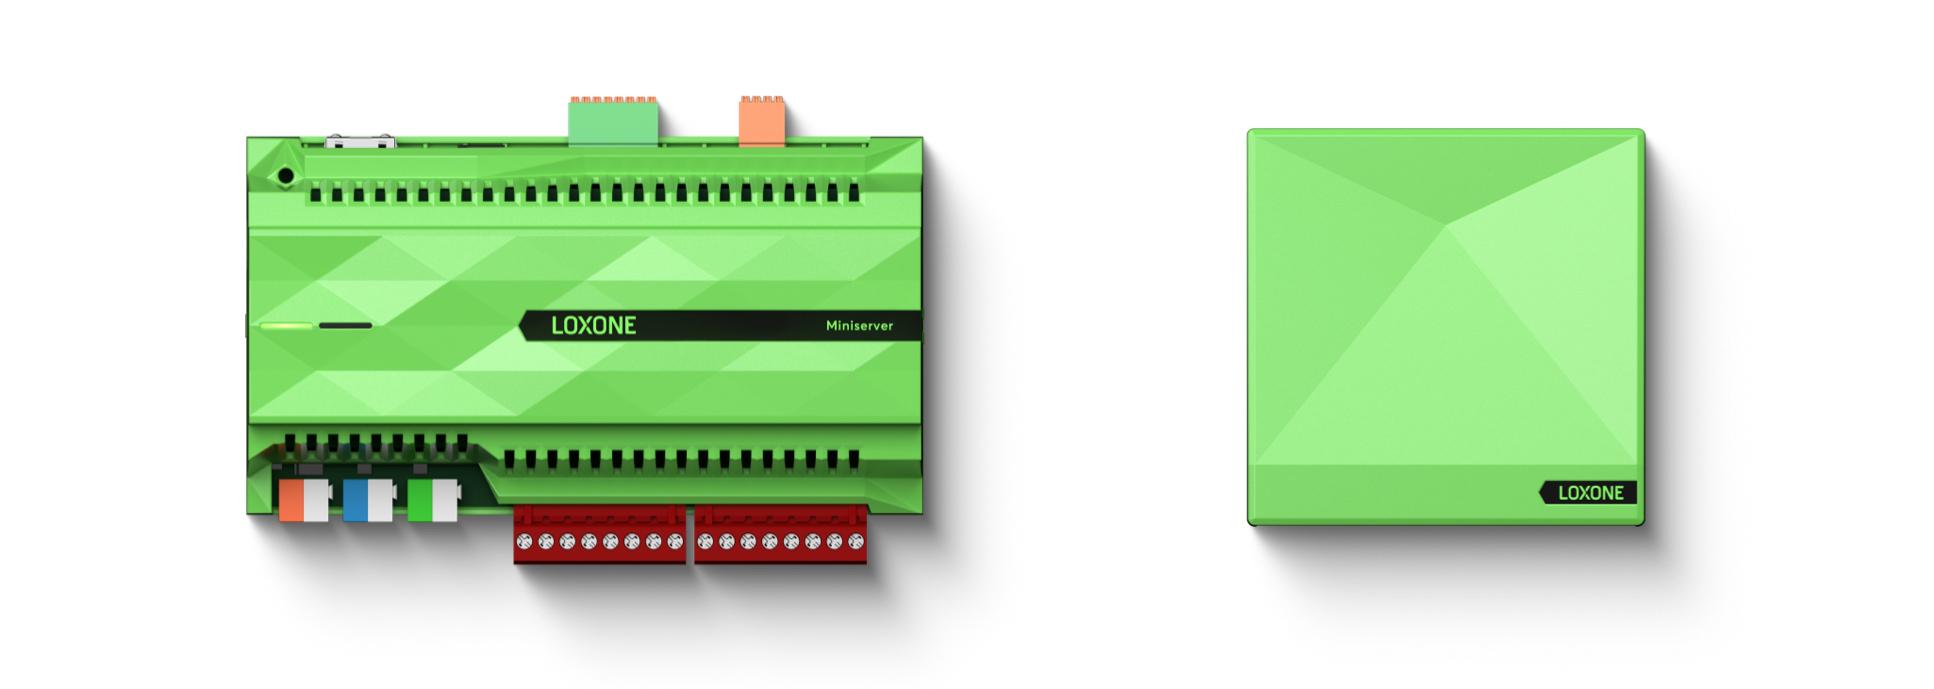 Loxone Miniserver a Miniserver Go